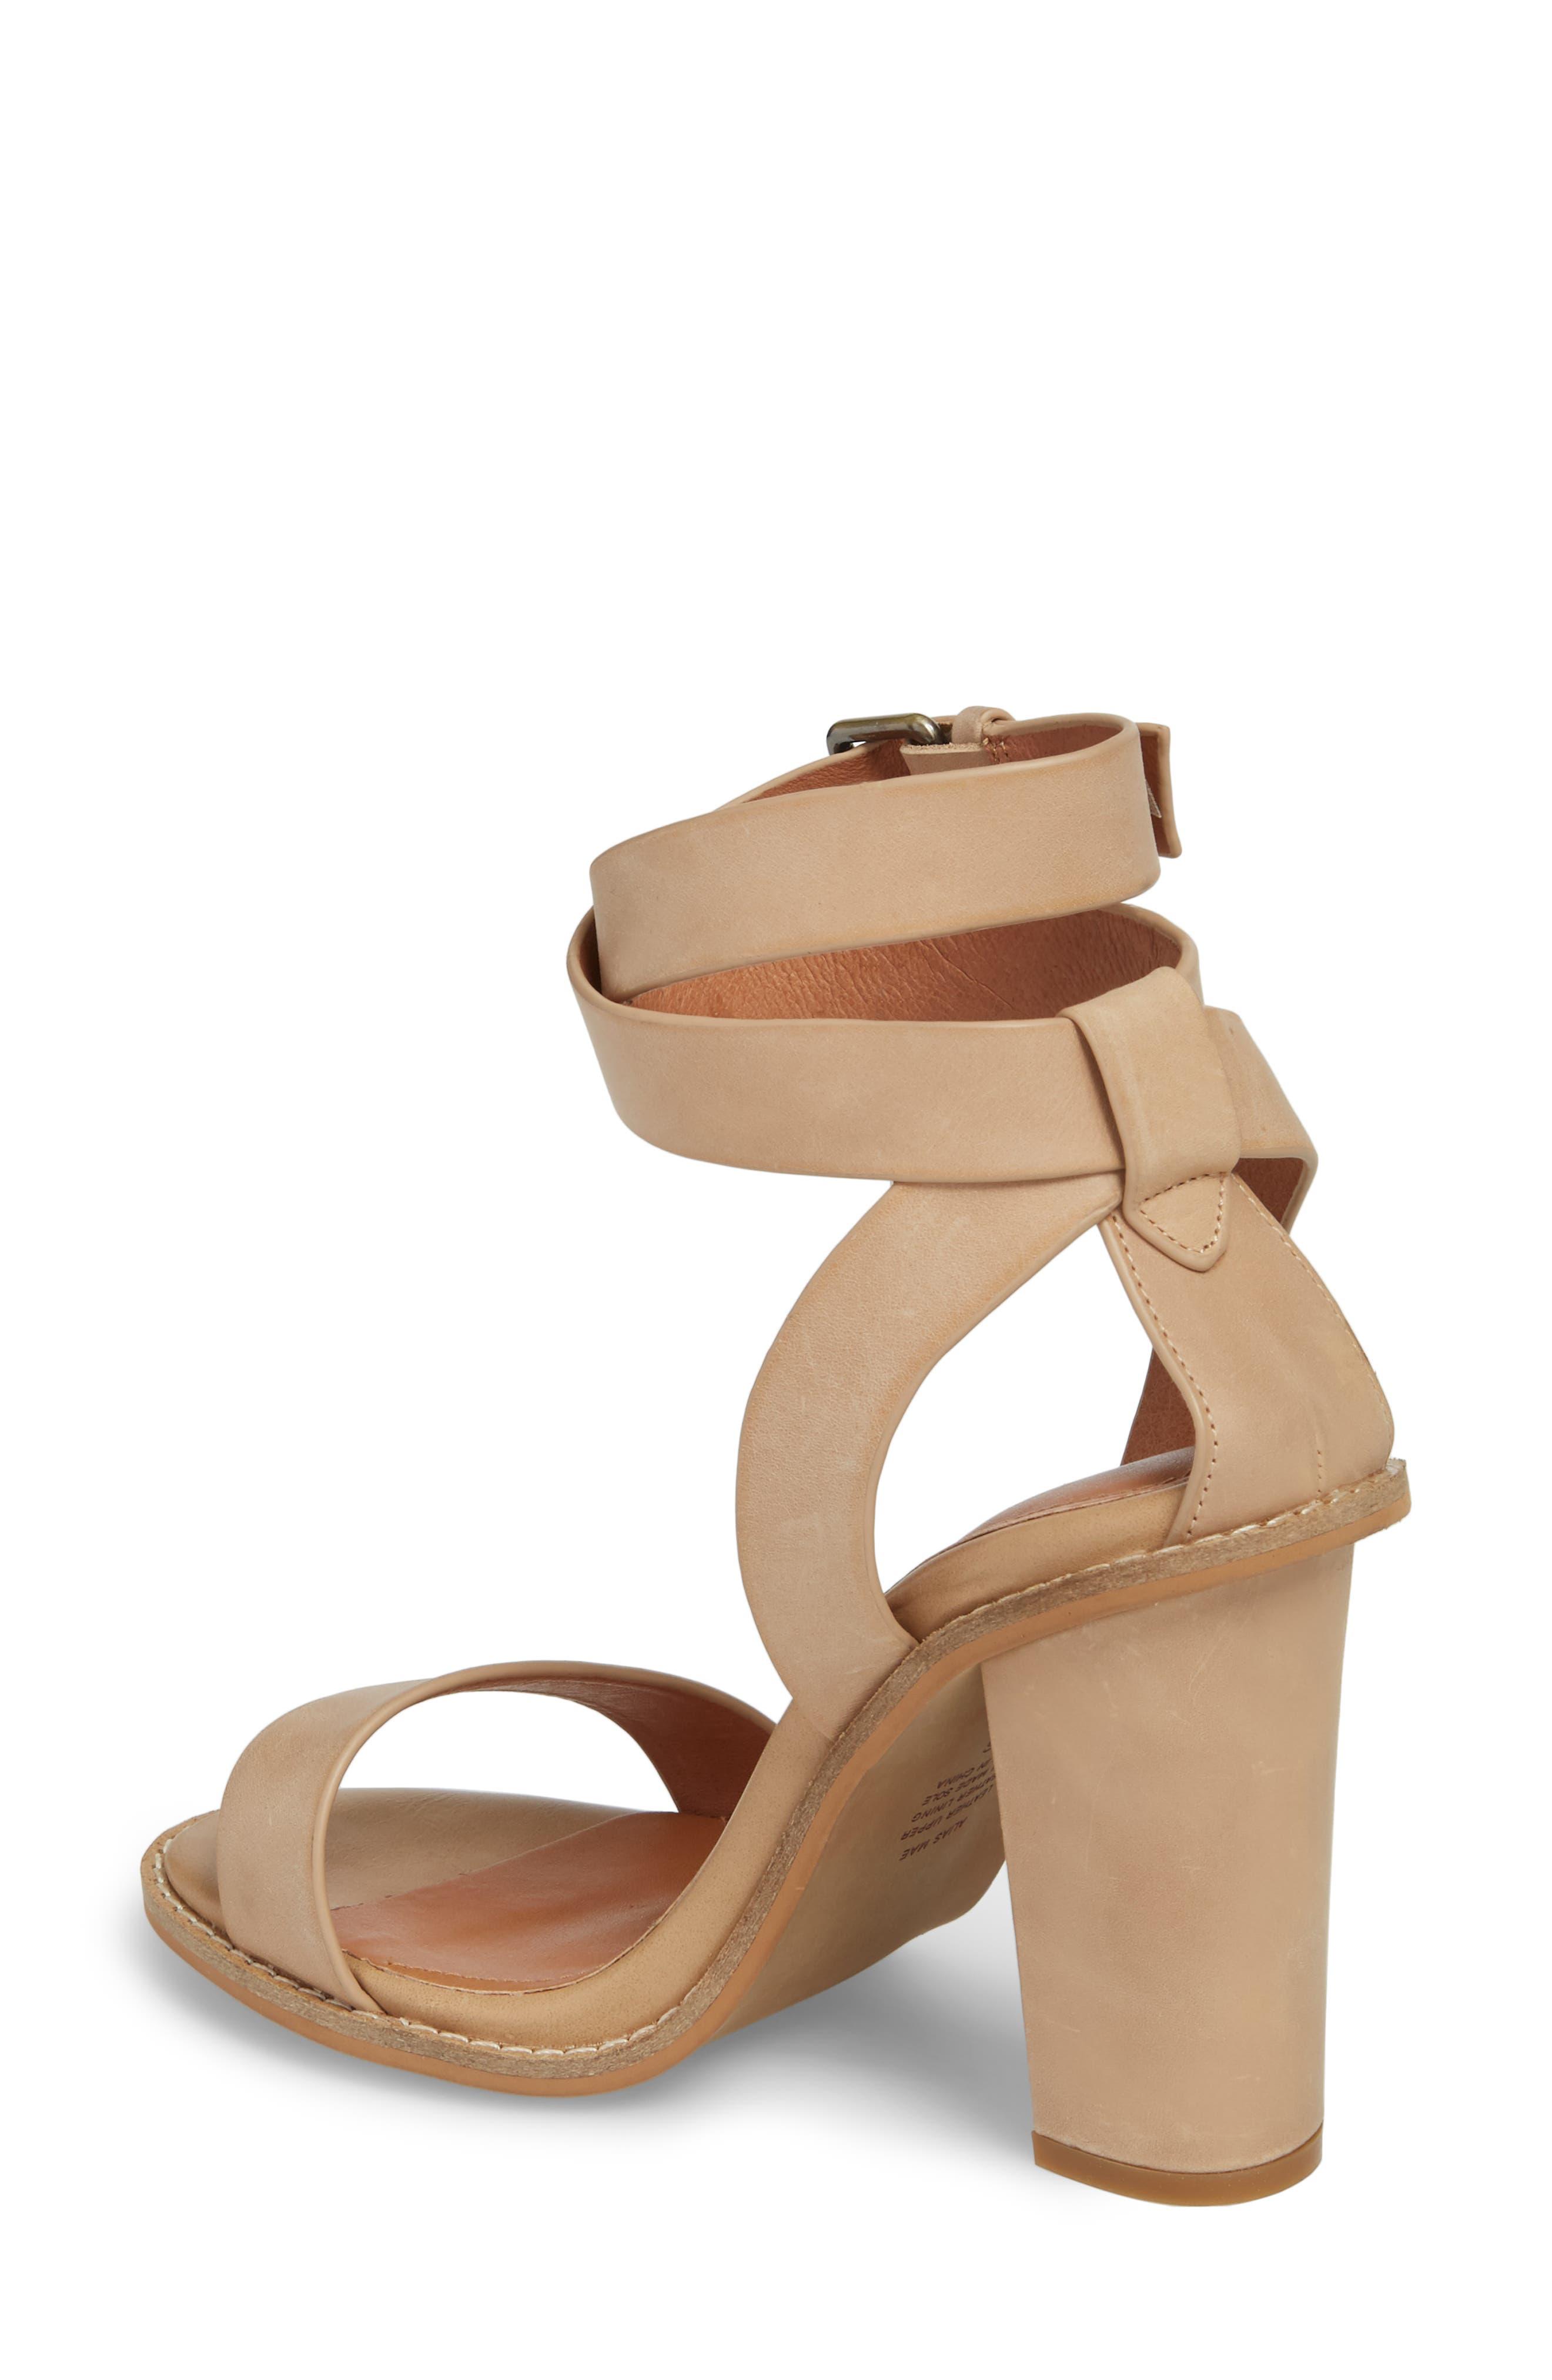 Calito Ankle Strap Sandal,                             Alternate thumbnail 4, color,